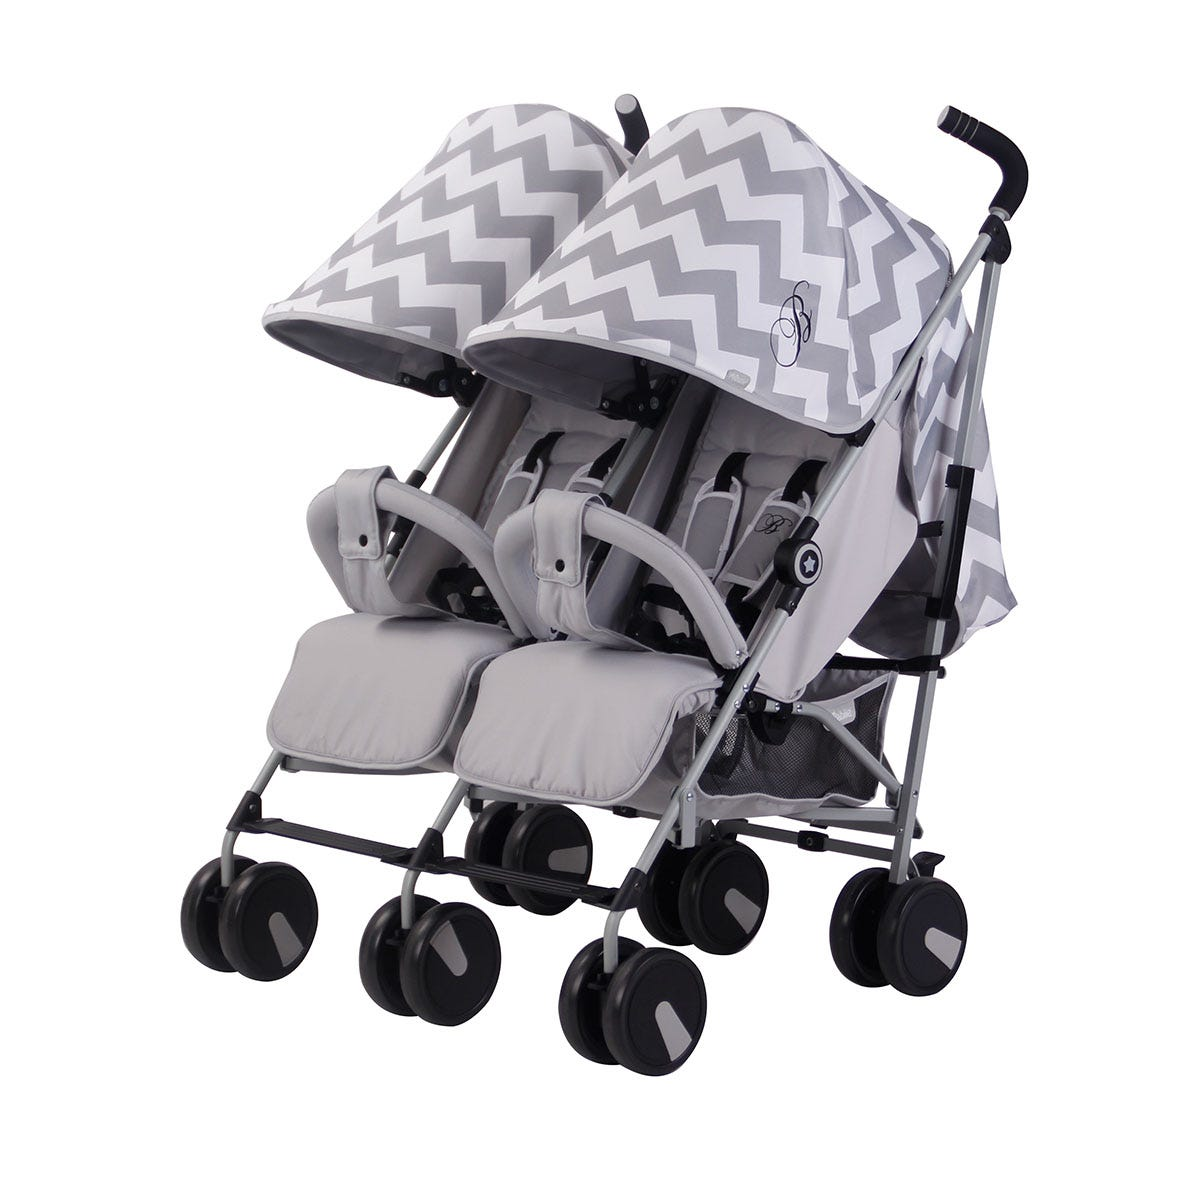 My Babiie Billie Faiers MB22 Chevron Twin Stroller - Grey